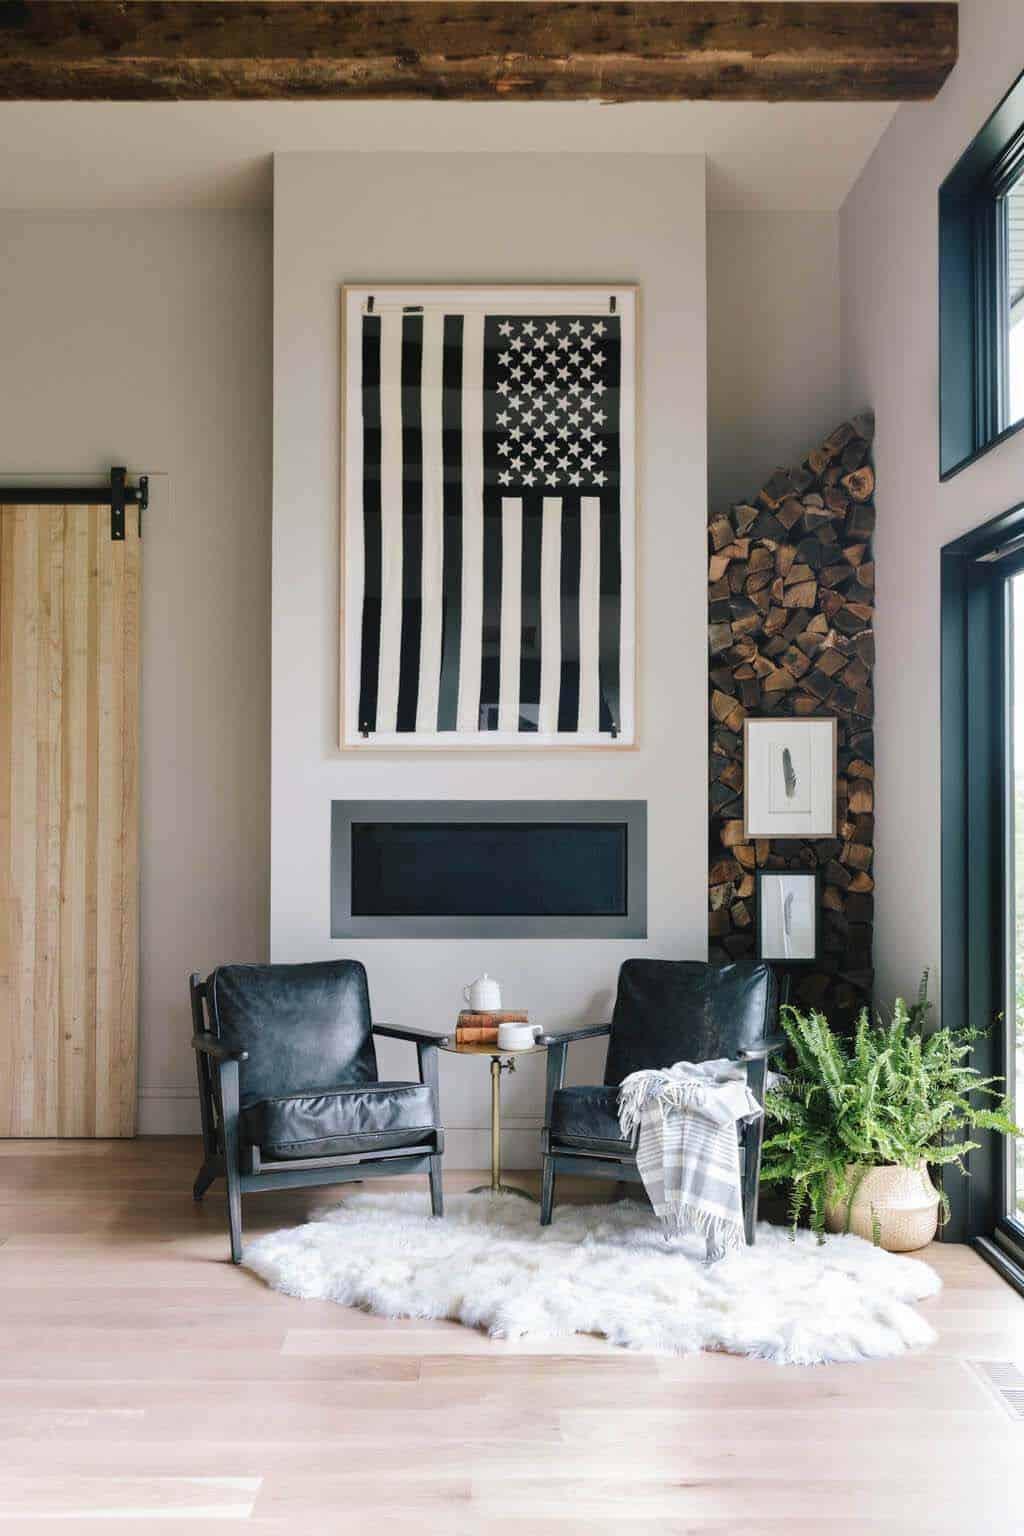 mountain-inspired-modern-family-room-fireplace